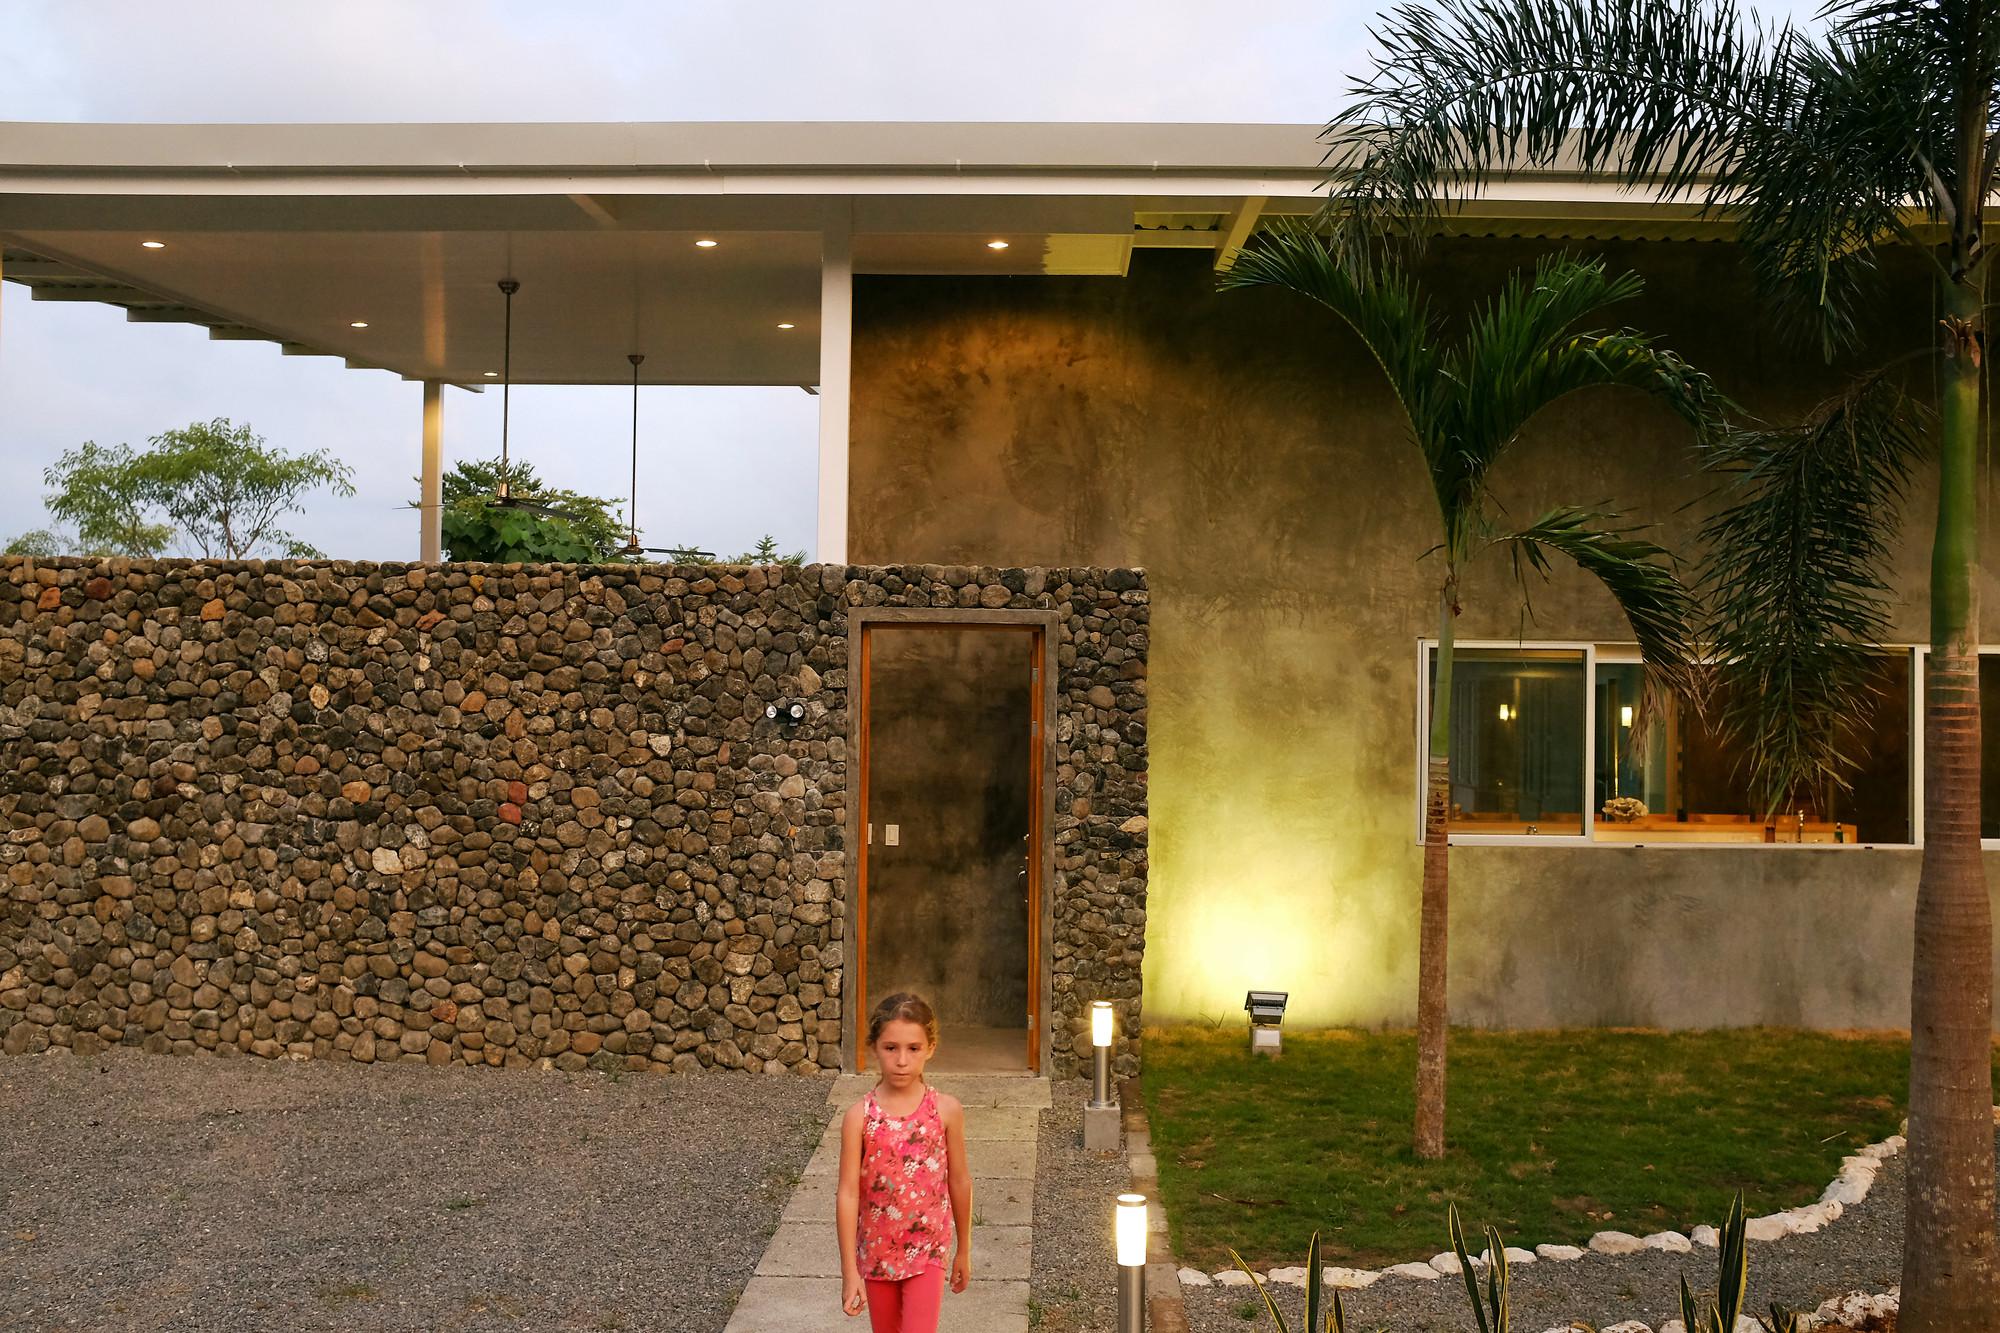 Galer a de casa jard n del mar salagnac arquitectos 3 for Casas jardin del mar